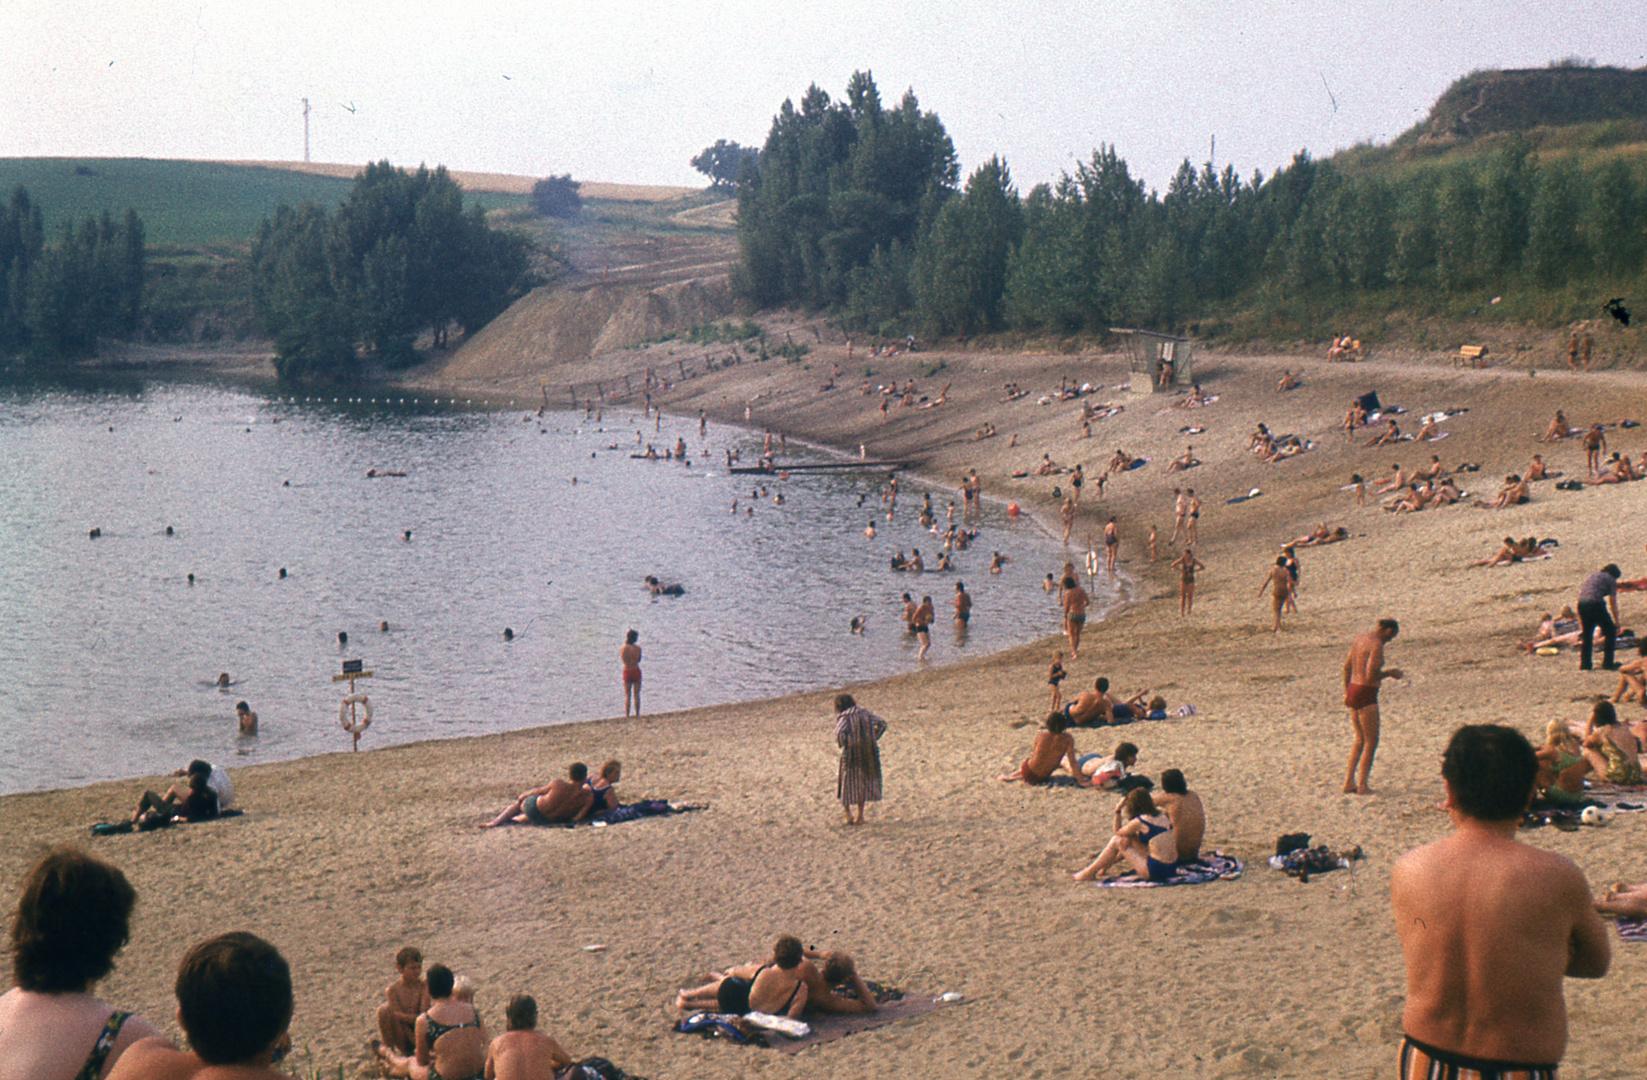 Strandbad Kretschau,Kr. Zeitz, 1973